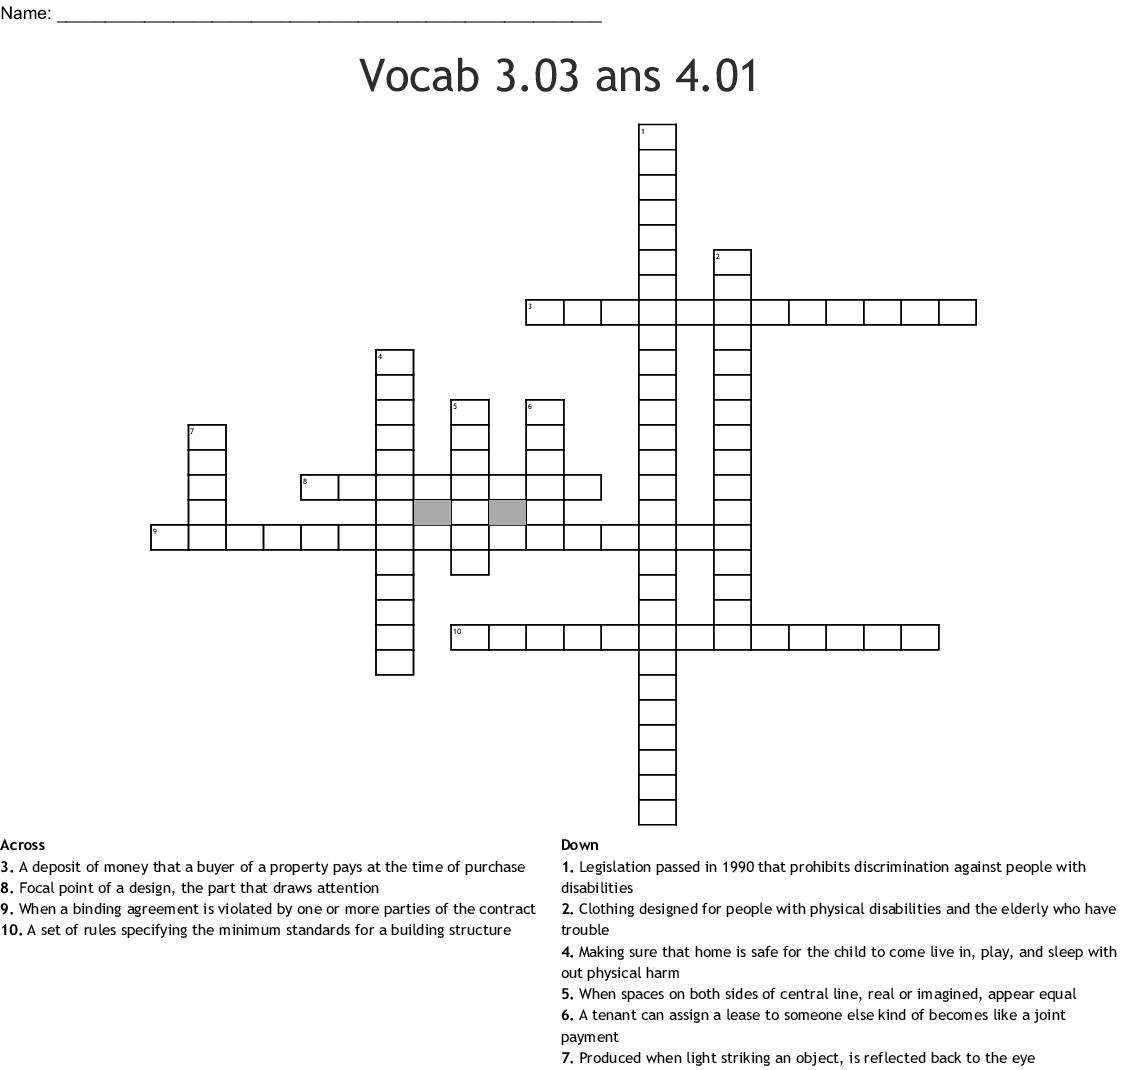 Vocab 3 03 Ans 4 01 Crossword